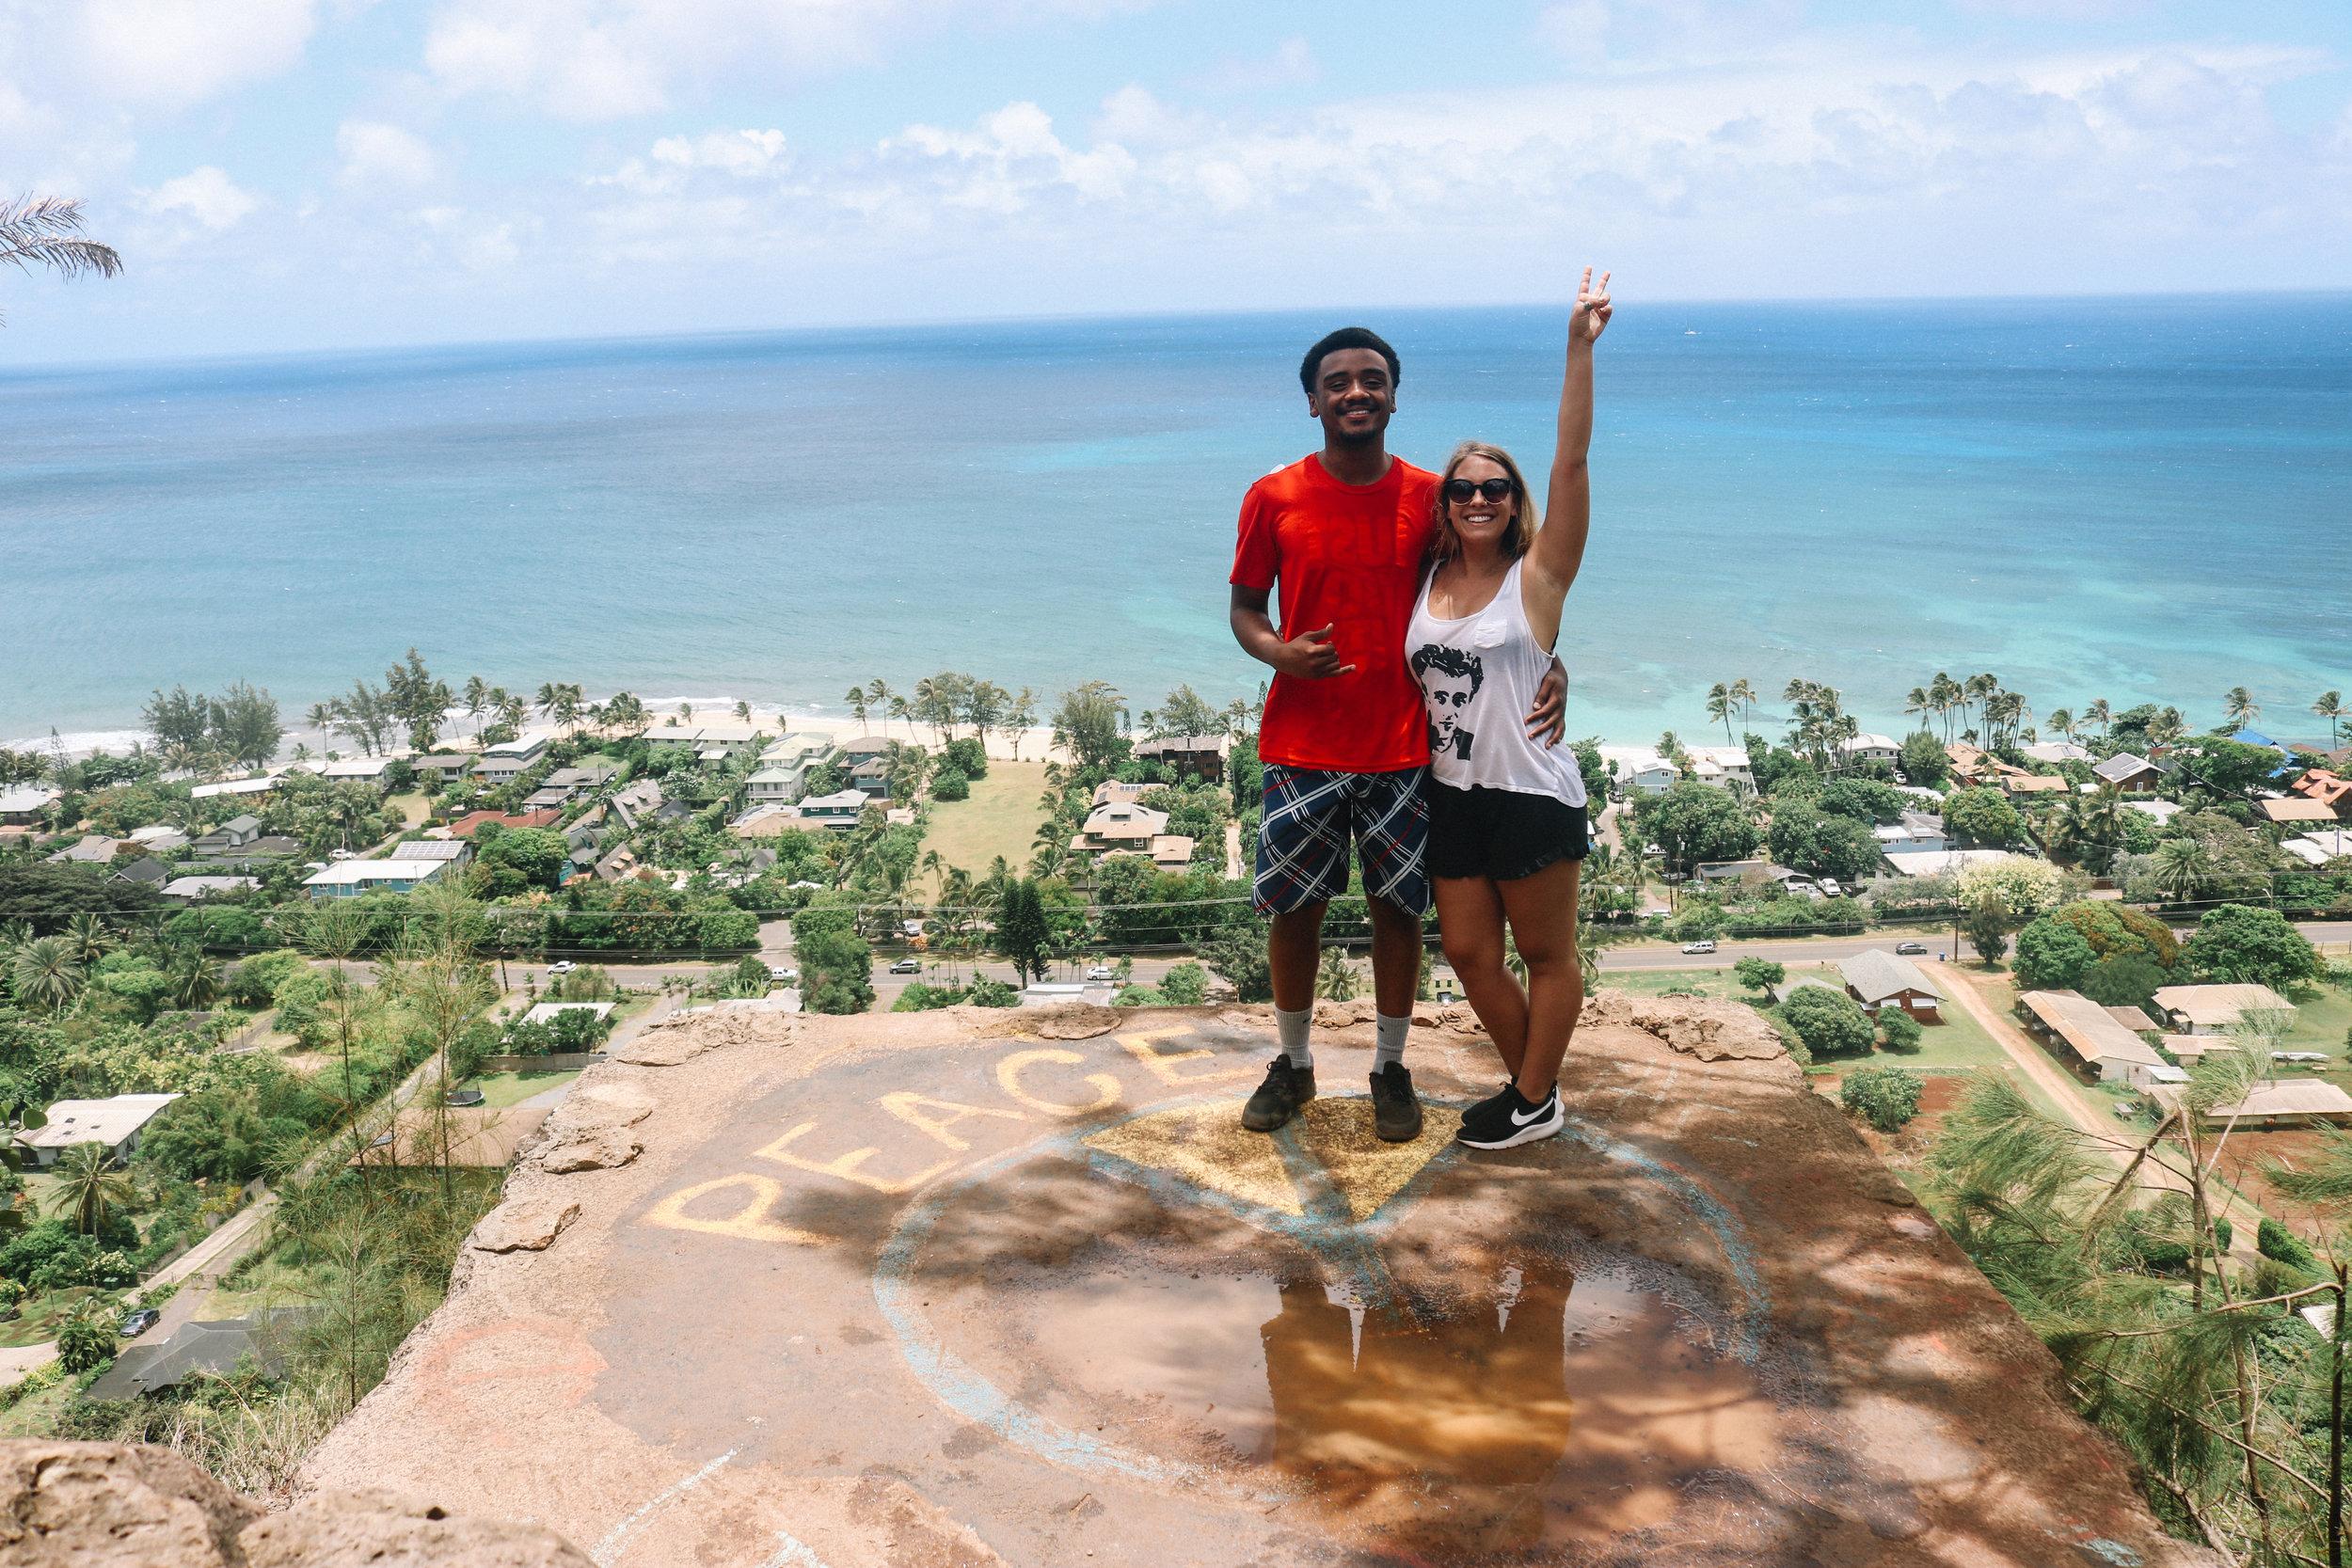 Ehukai Pillbox, North Shore Oahu, Oahu Hikes, Hikes on Oahu, Family Hikes, Hawaii, Family Hikes on Oahu, SaltWaterVibes